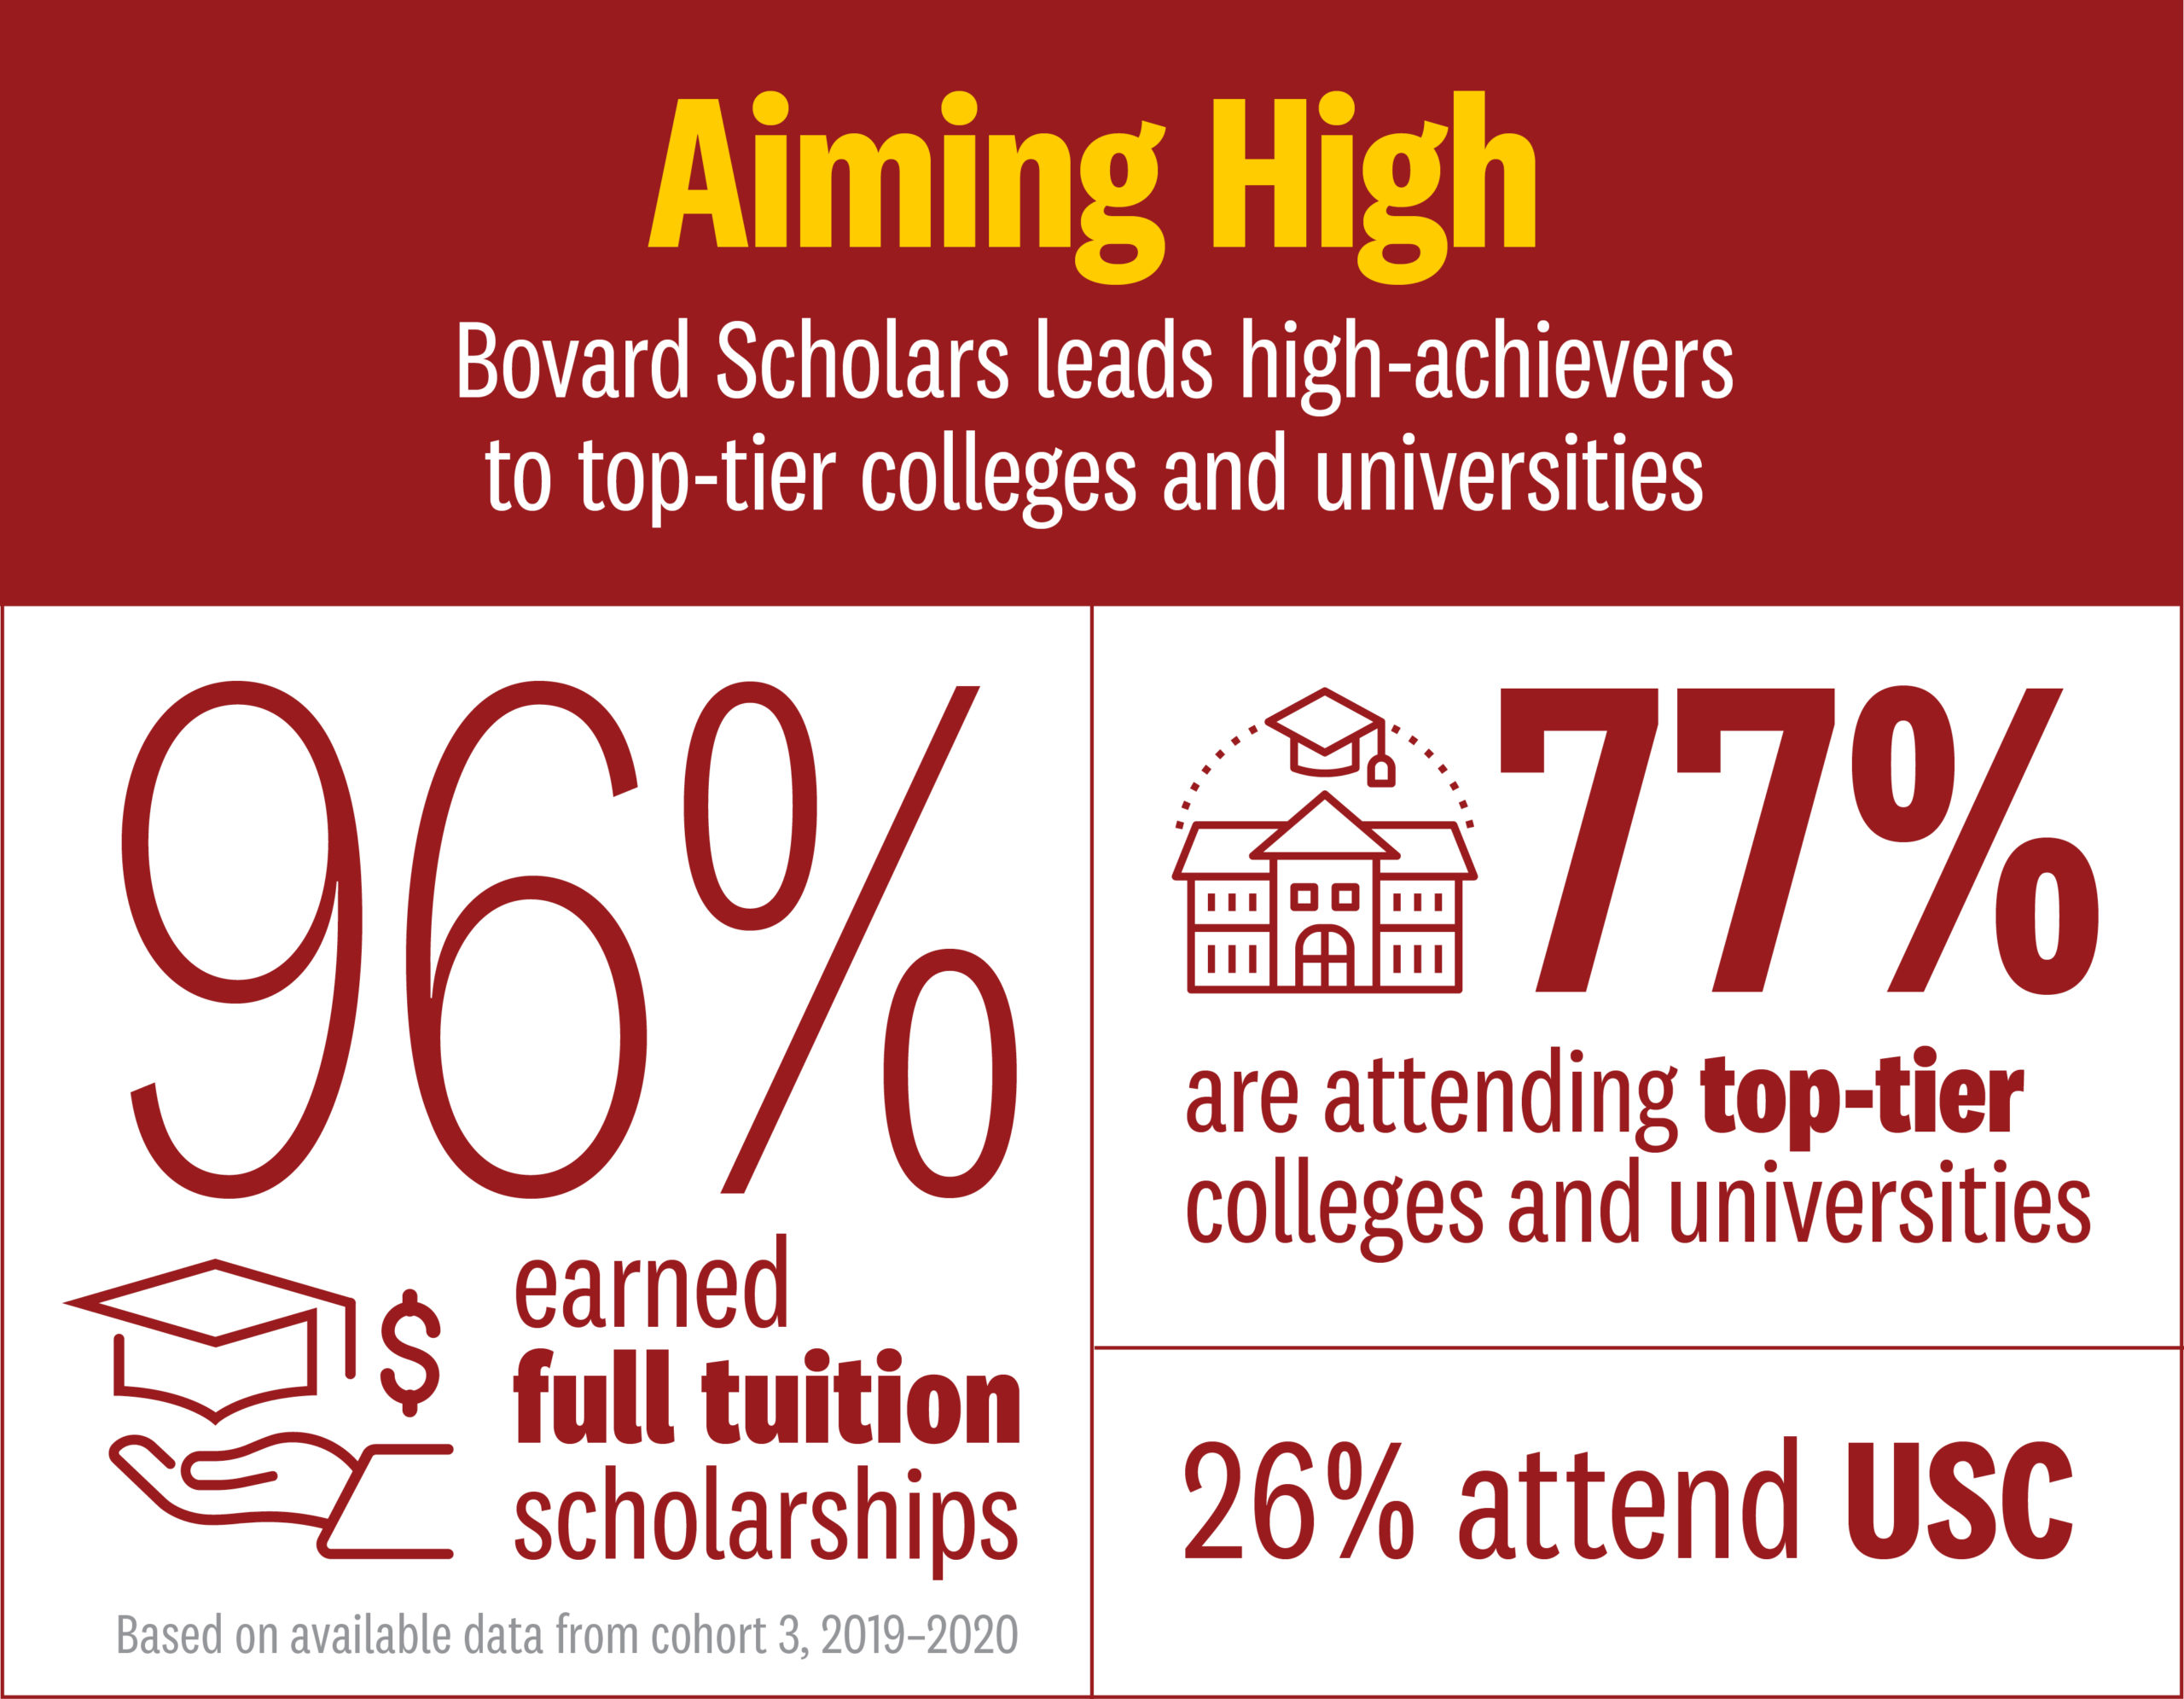 Bovard Scholars 2020